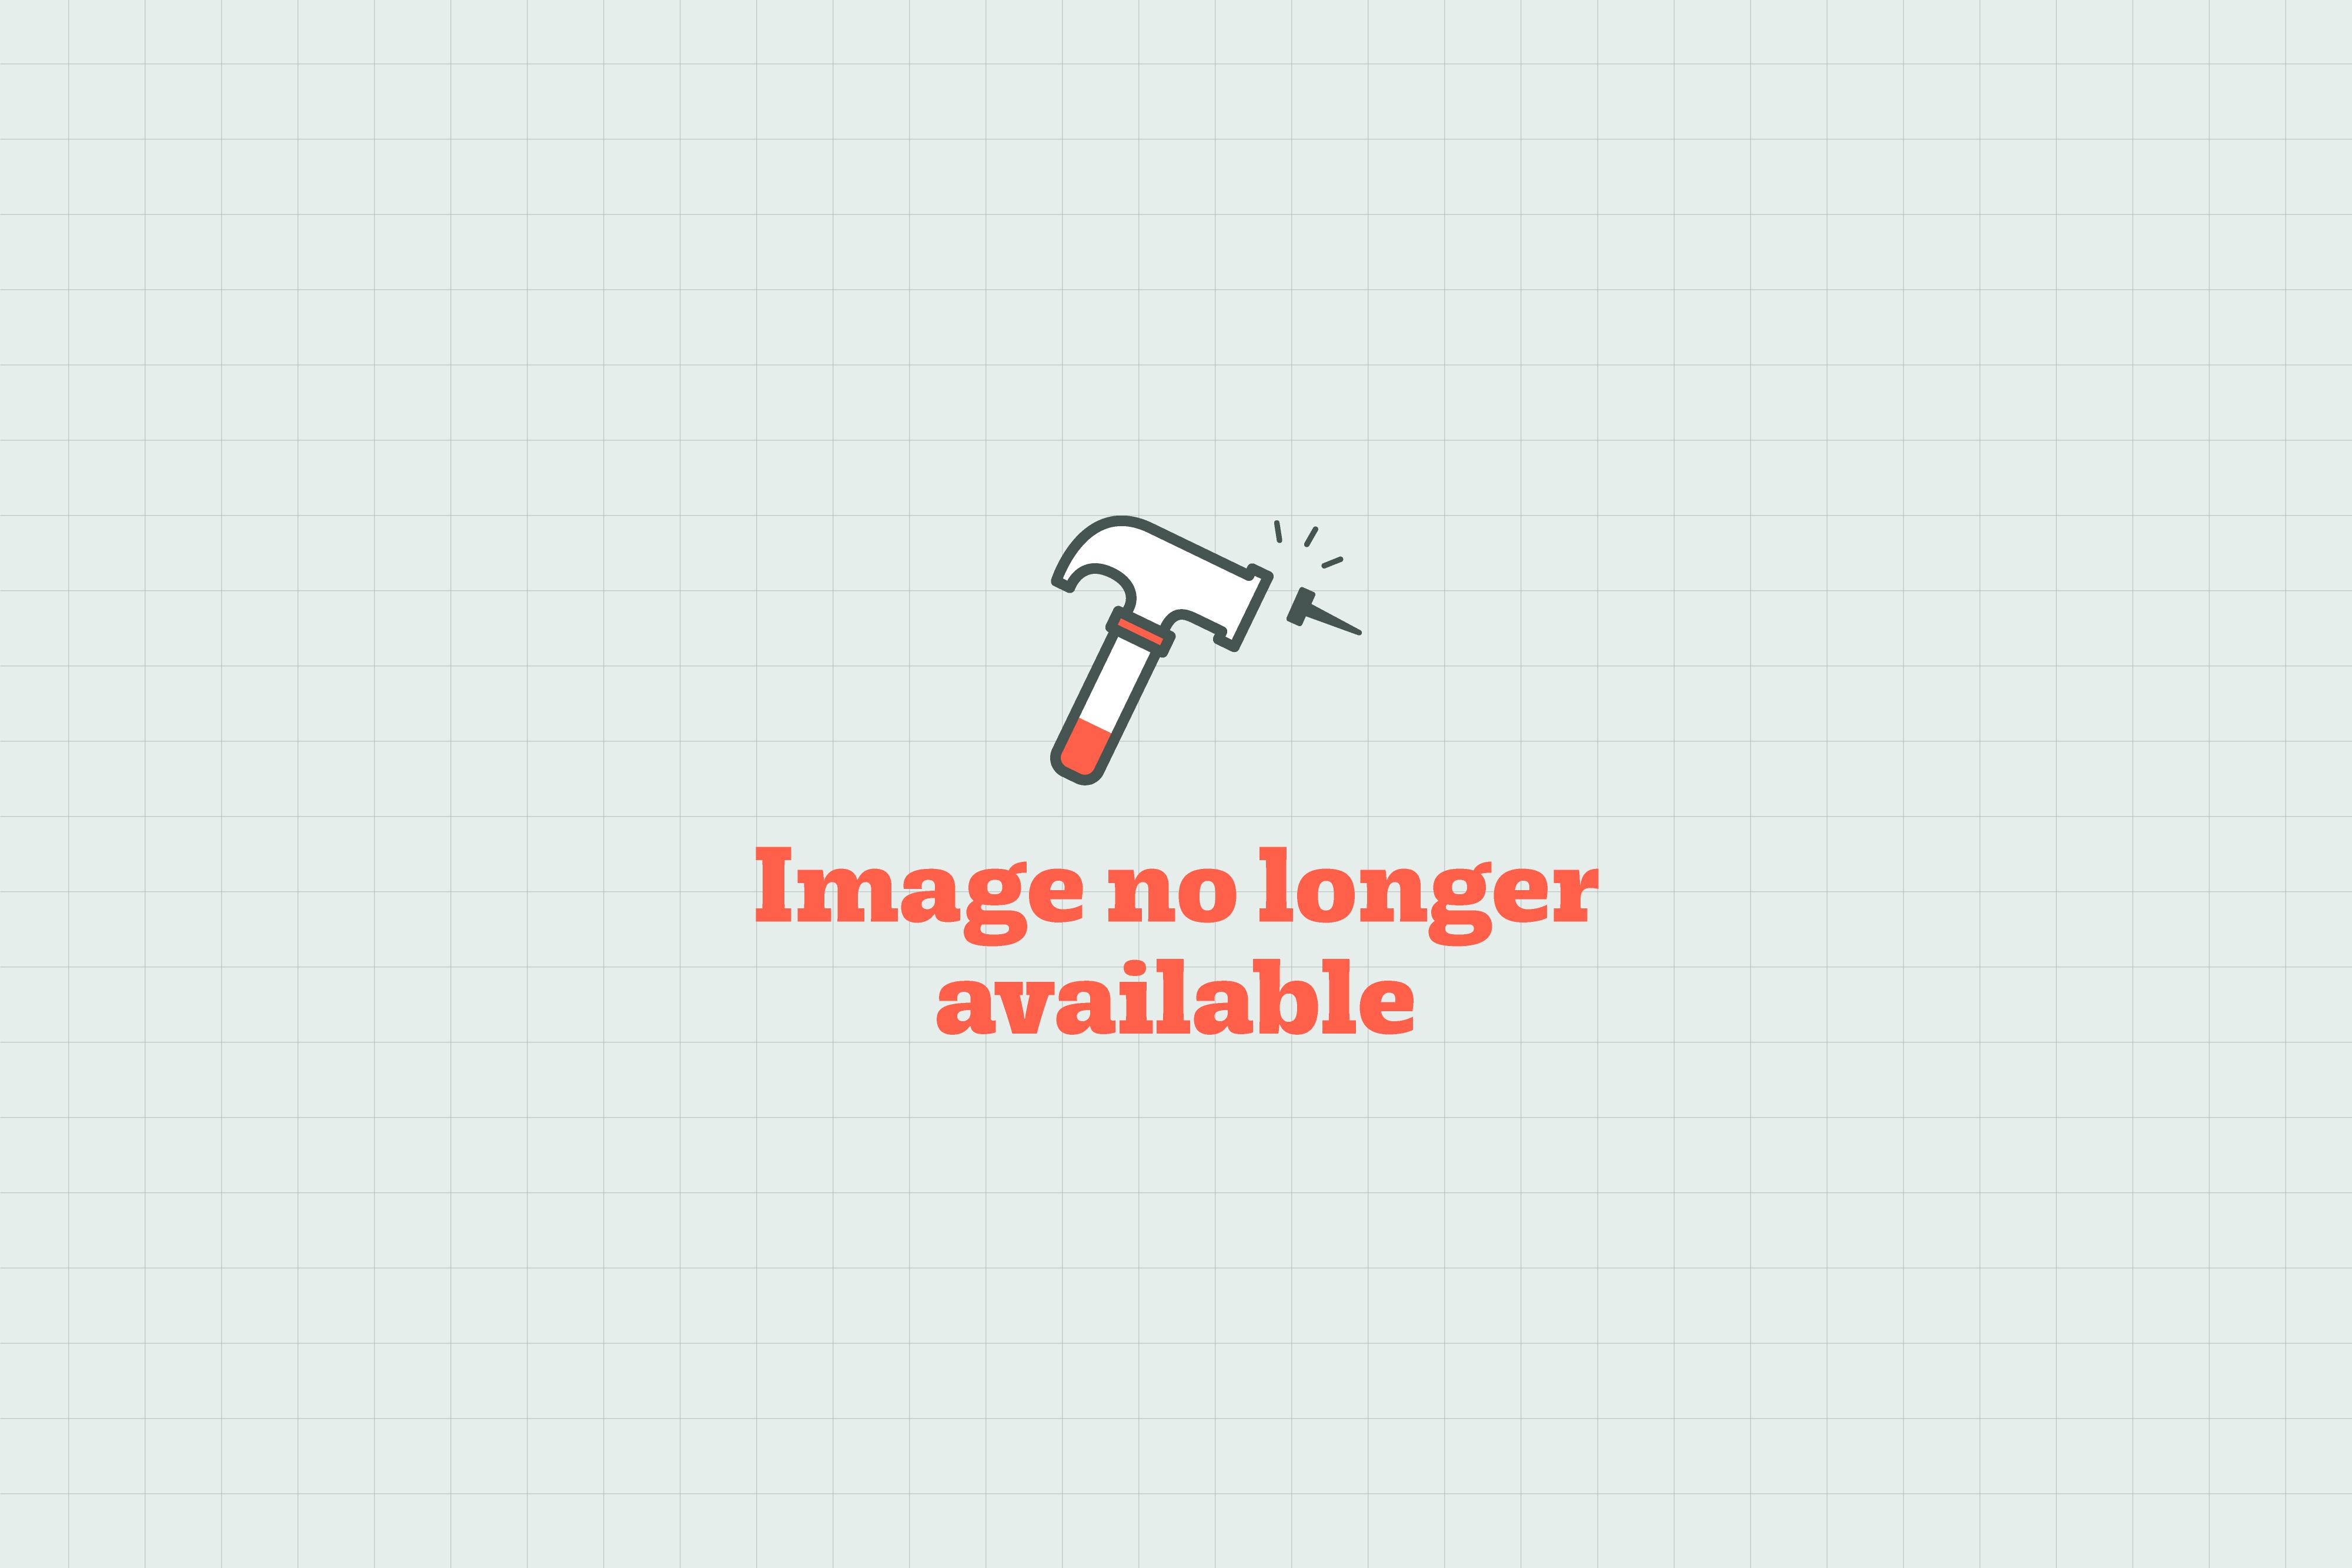 133 Ridgeway Rd Hillsborough print 001 60 Front 4200x2800 300dpi.0 Top Result 50 Lovely Brand New Homes for Sale Image 2017 Hjr2